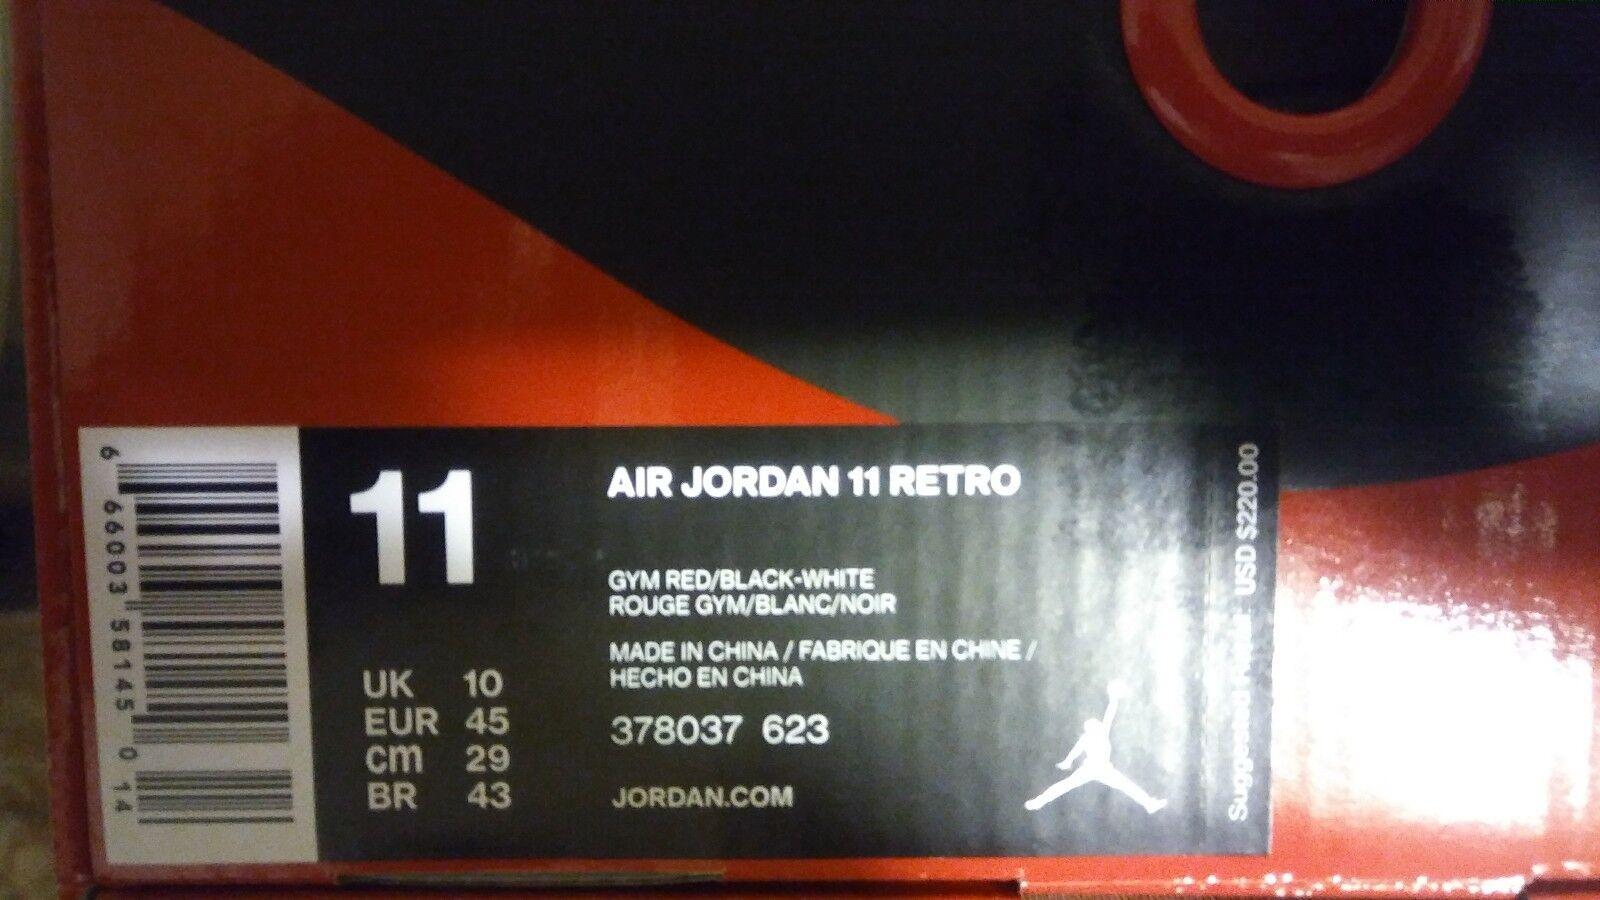 Nike air jordan retrò 11 xi vincere come 96 palestra red taglia 11